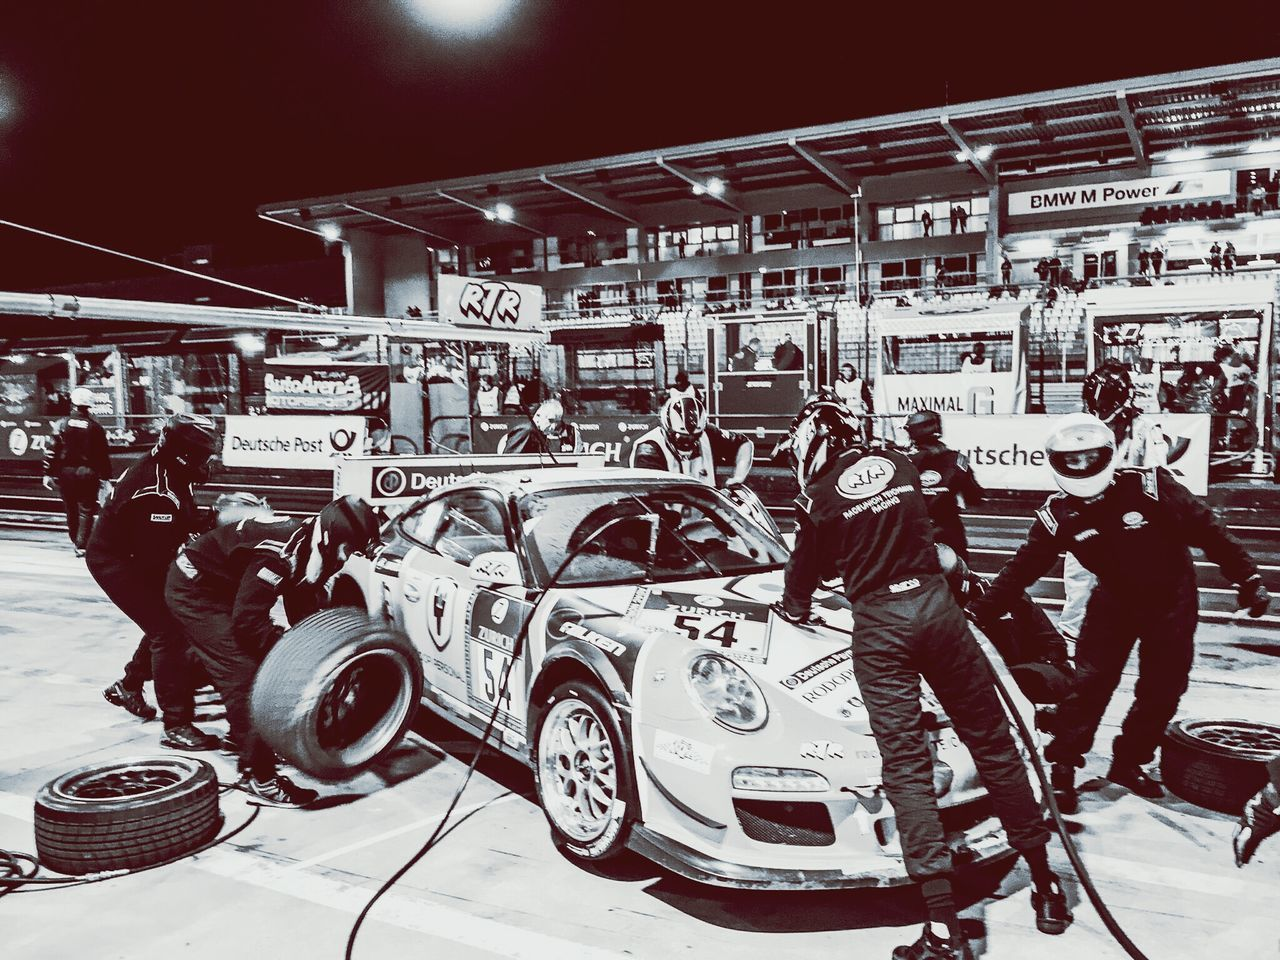 Black And White Blackandwhite Photography Racing Racecar Porsche Nurburgring 24h Race 24h Blackandwhite Boxengasse